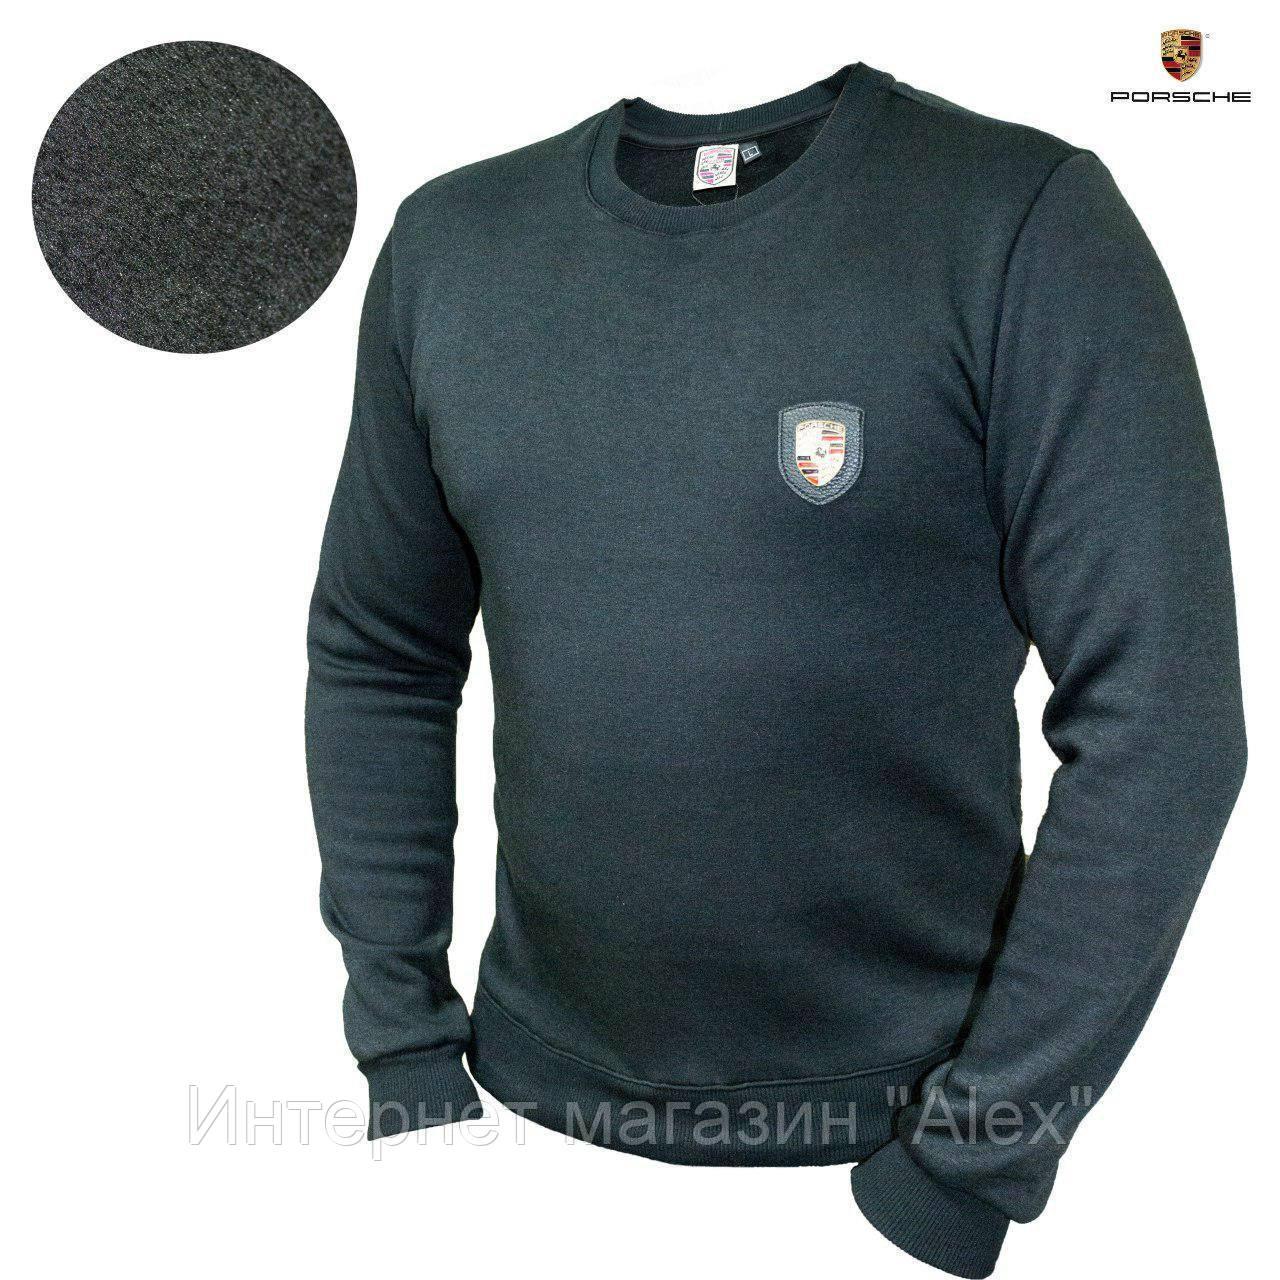 783e96a3eac Мужской Батник. Реплика Porsche Design. Мужская одежда  продажа ...